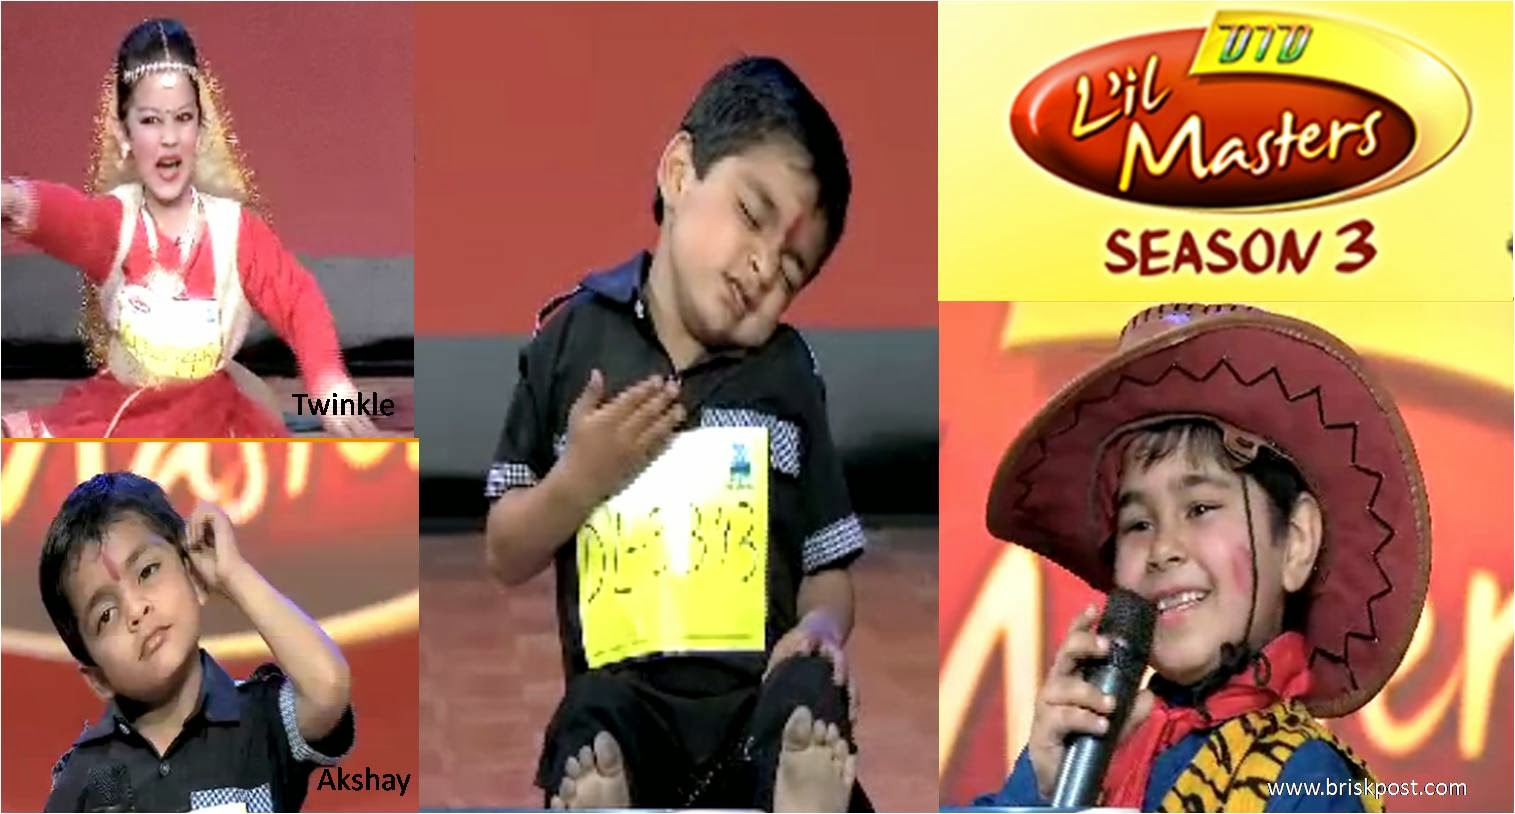 Bachchagiri in DID Little Masters Season 3: Delhi Auditions Rocked